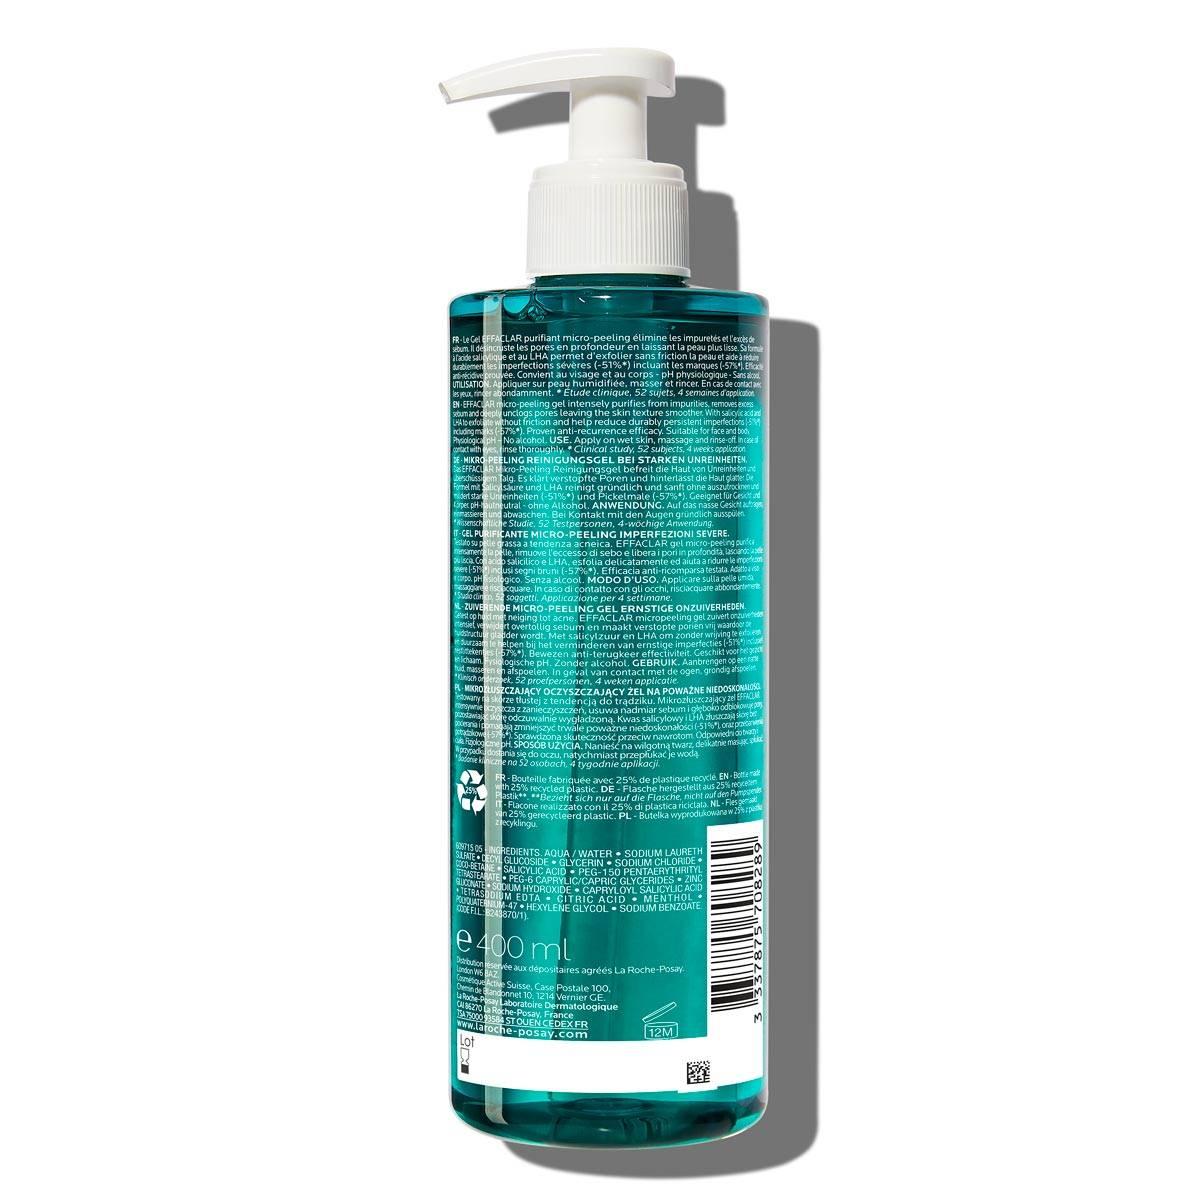 Effaclar Micro Peeling Purifying Gel 400ml 2% Salicylic Acid Oily Skin BSS